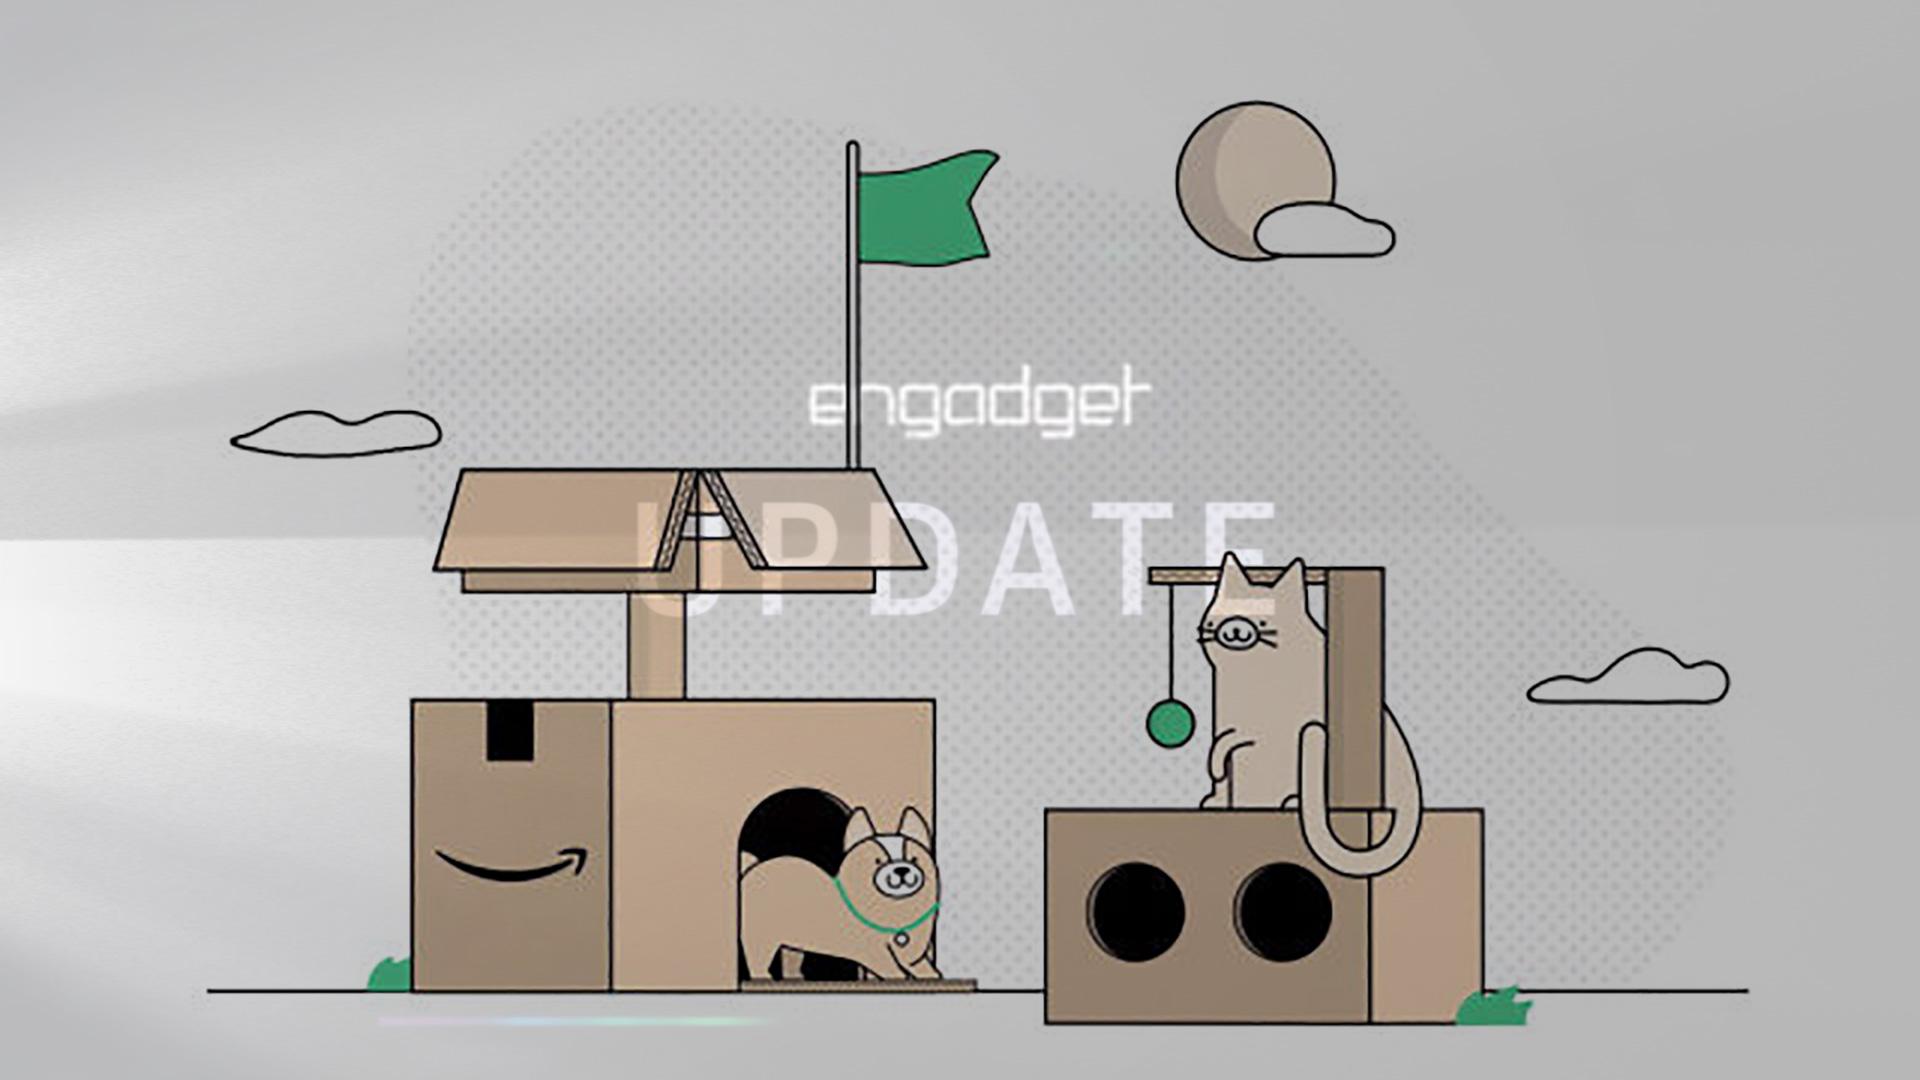 Engadget Update EP67